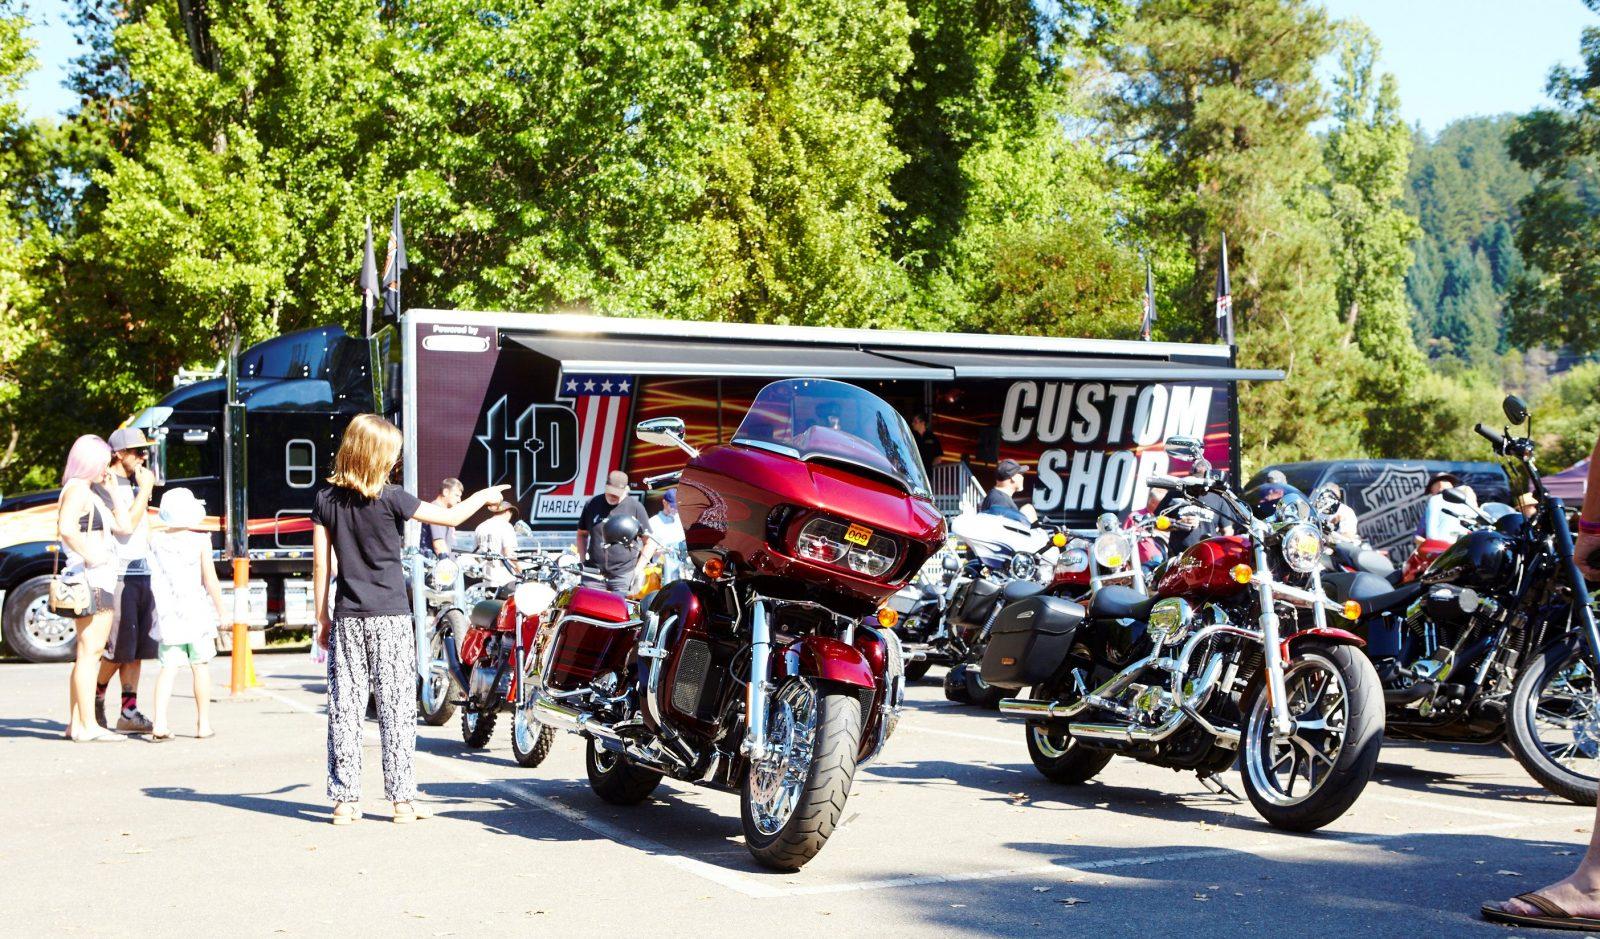 Brighter Days Festival - Cars, bikes, music